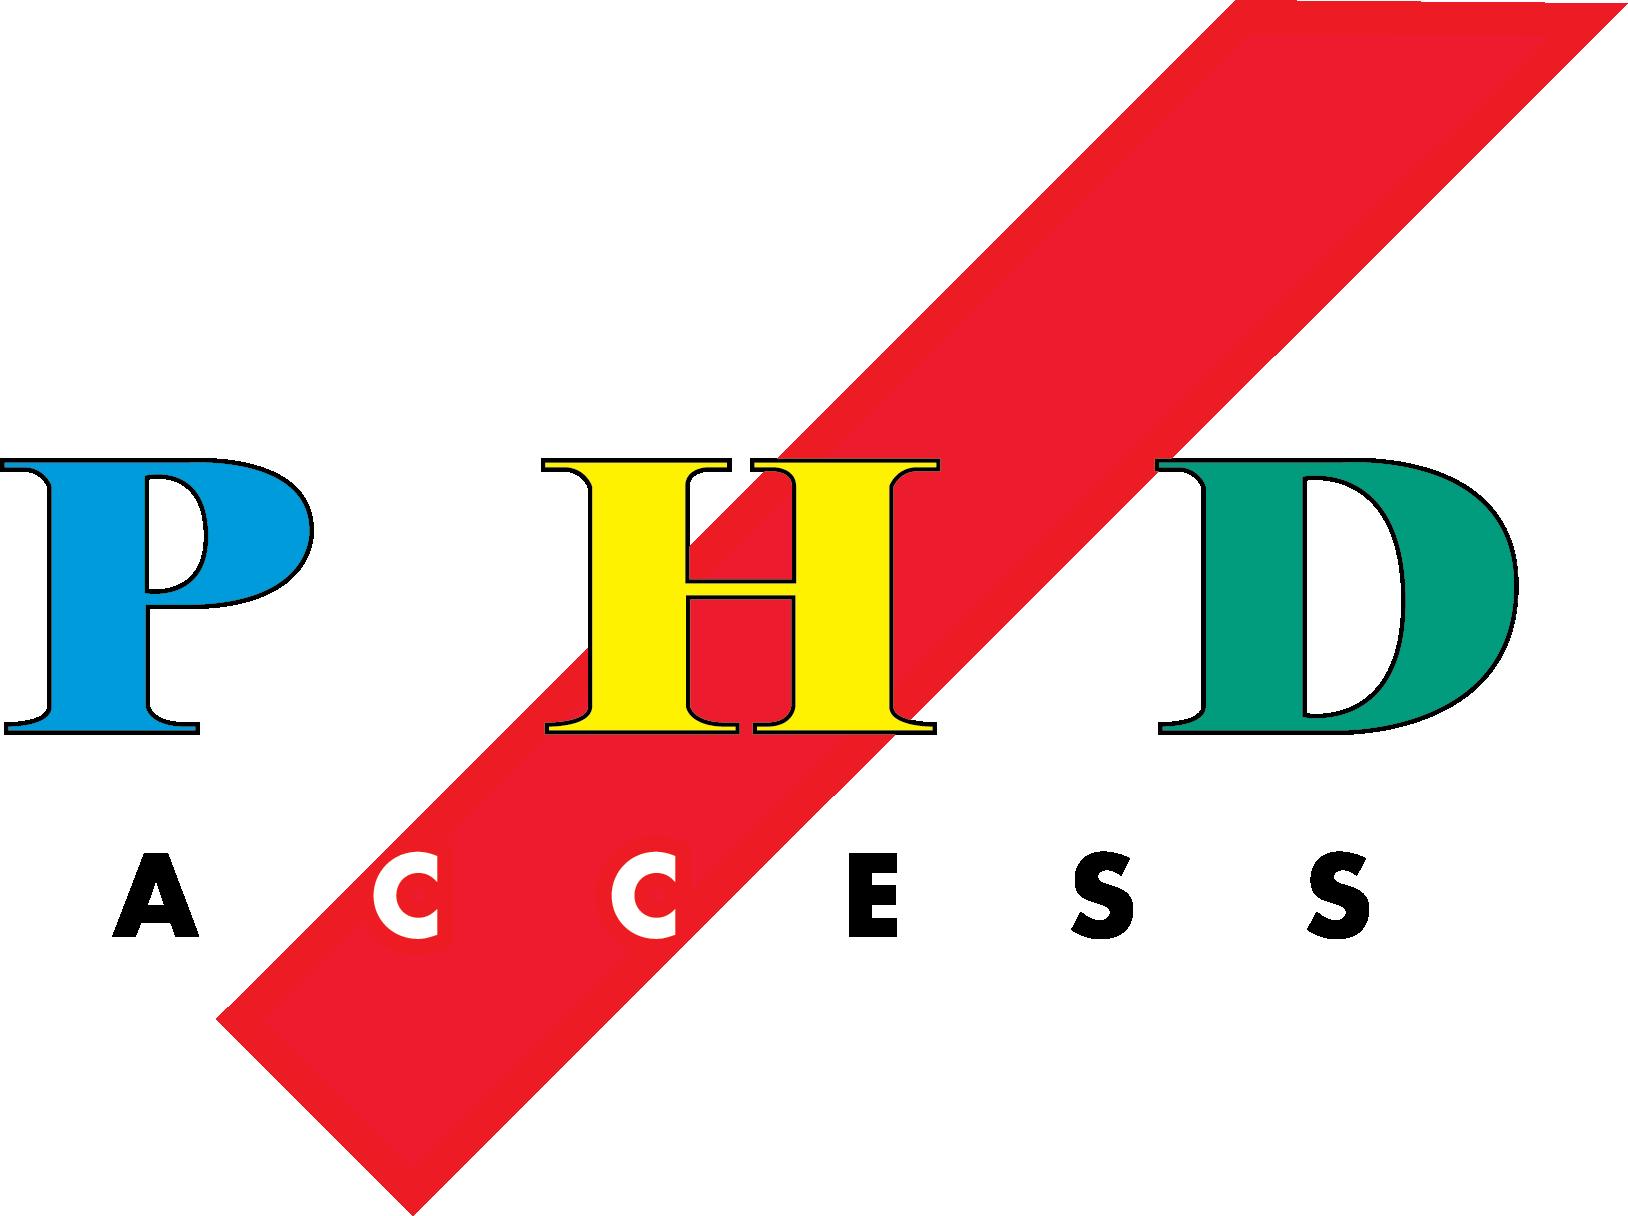 Phd Modular Access Services Ltd Logo